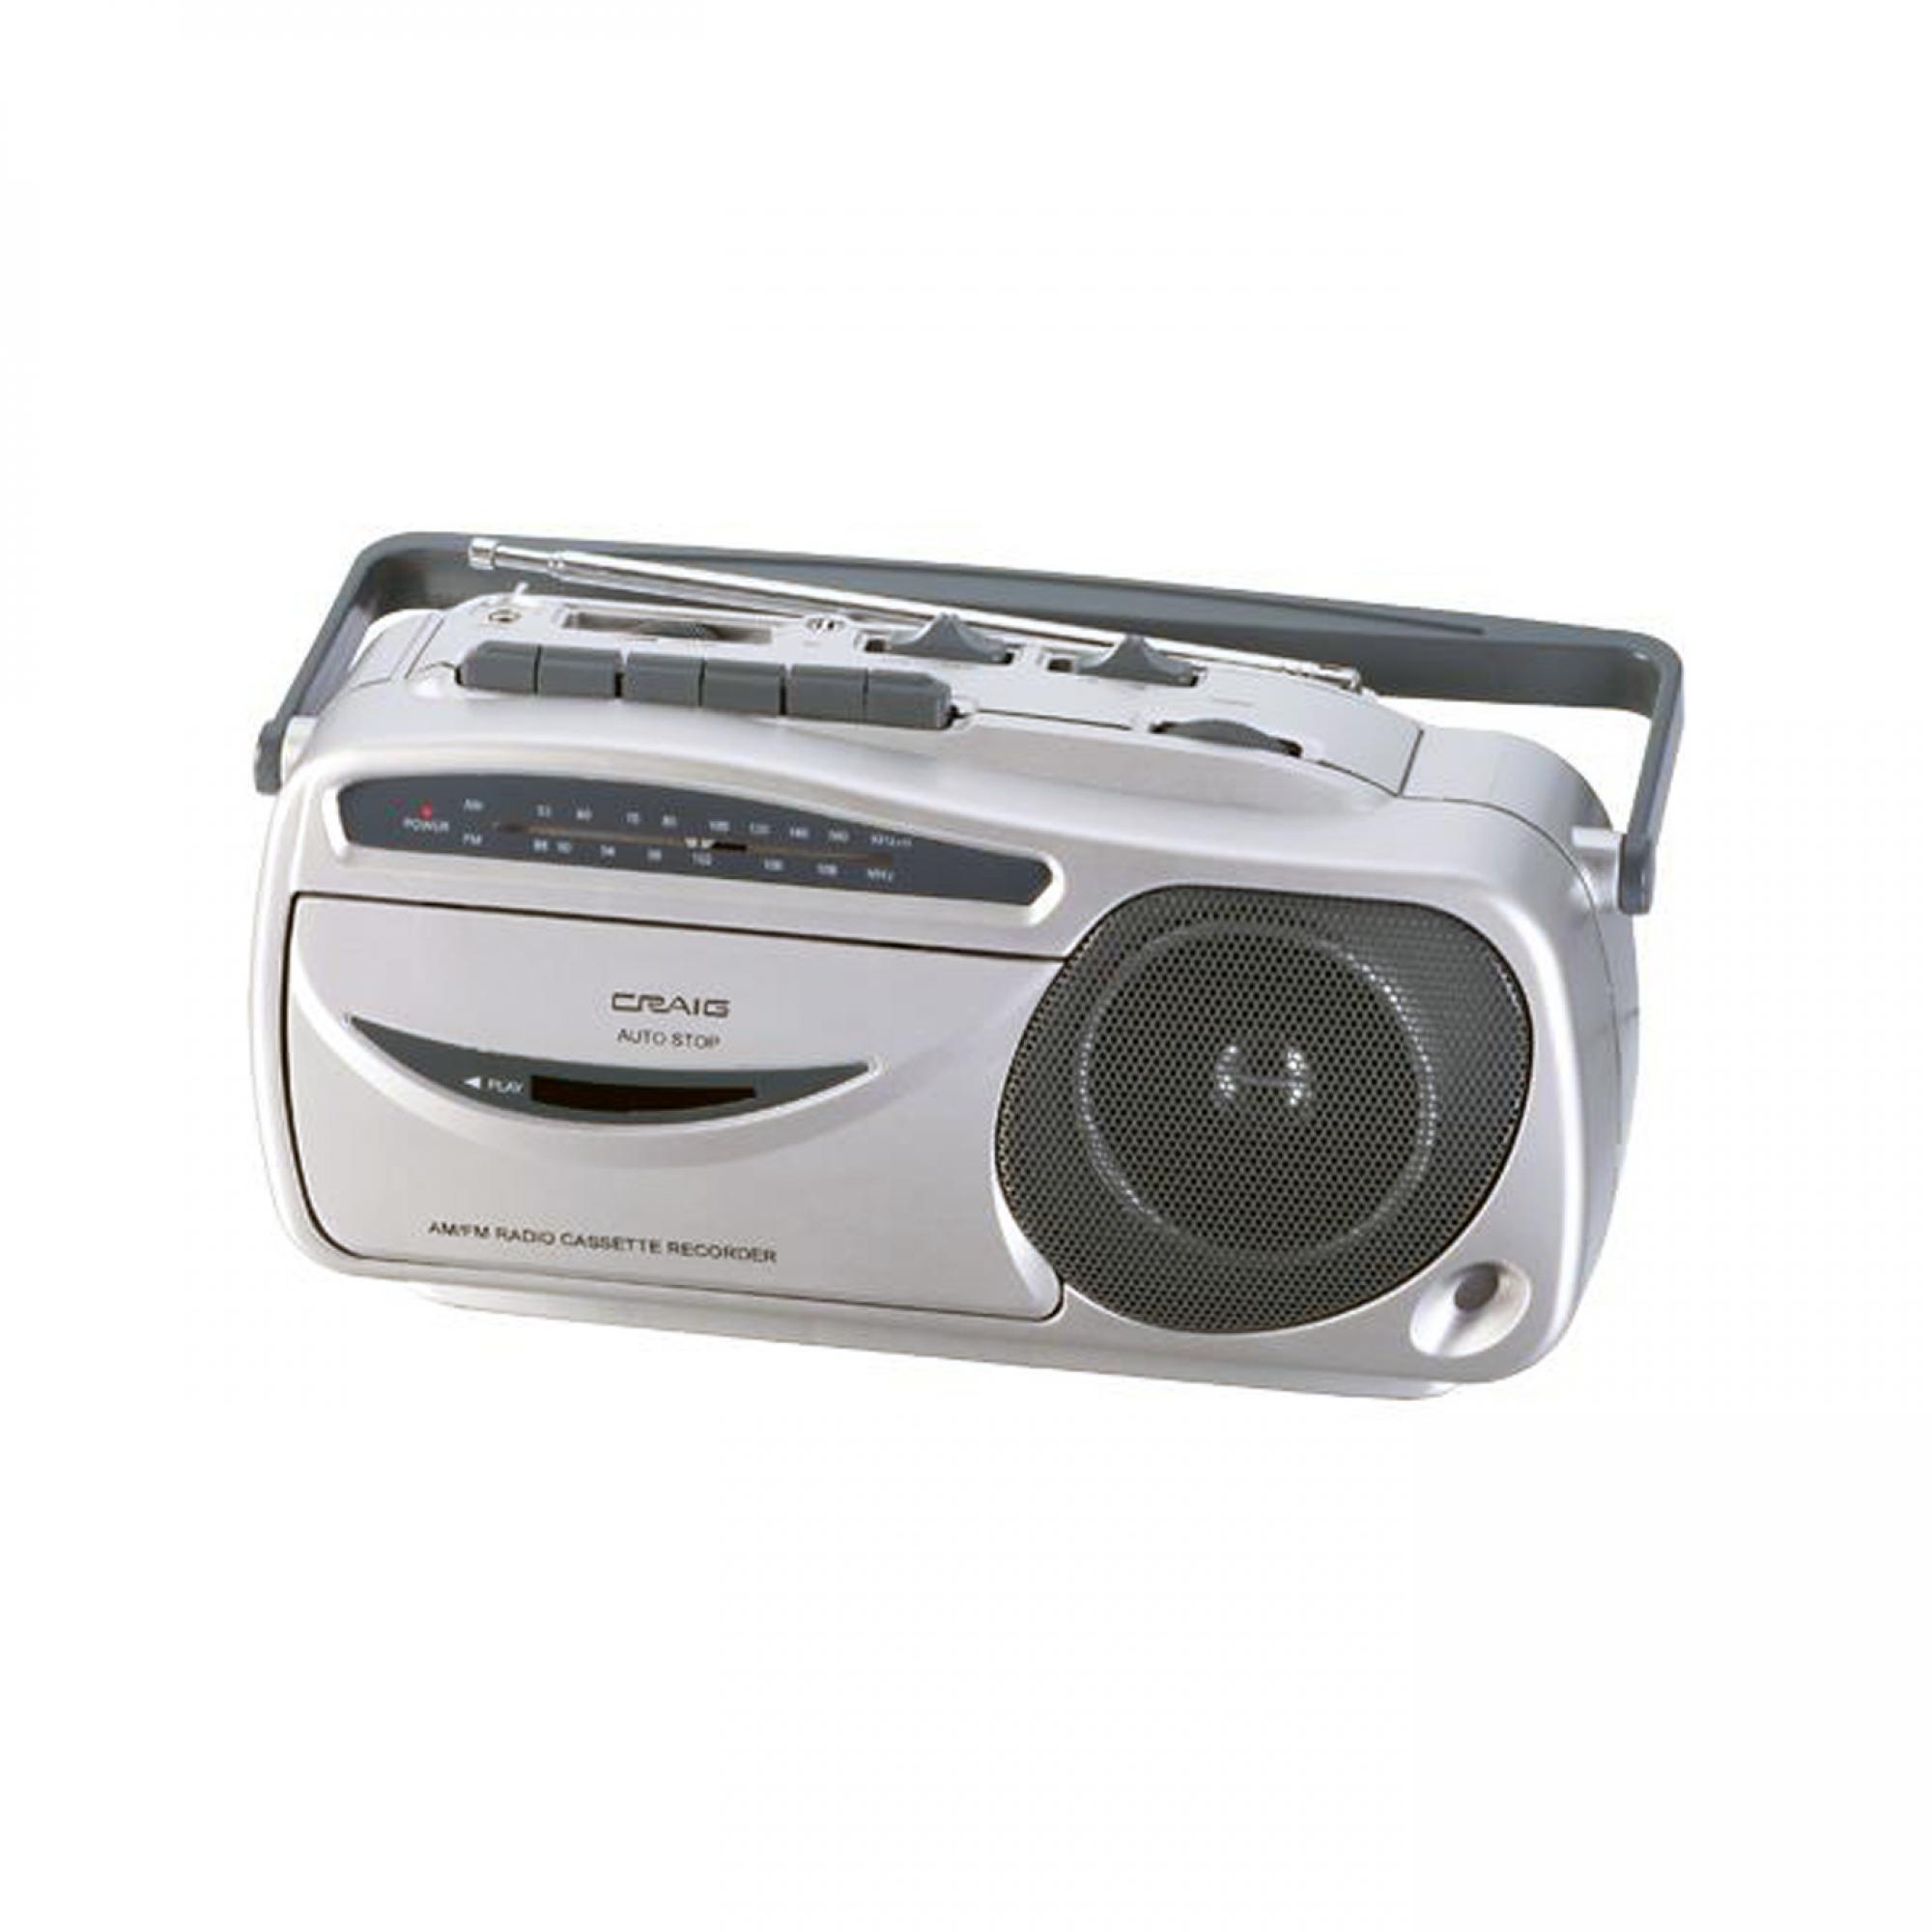 Craig Portable AM/FM Radio Cassette Recorder and Player